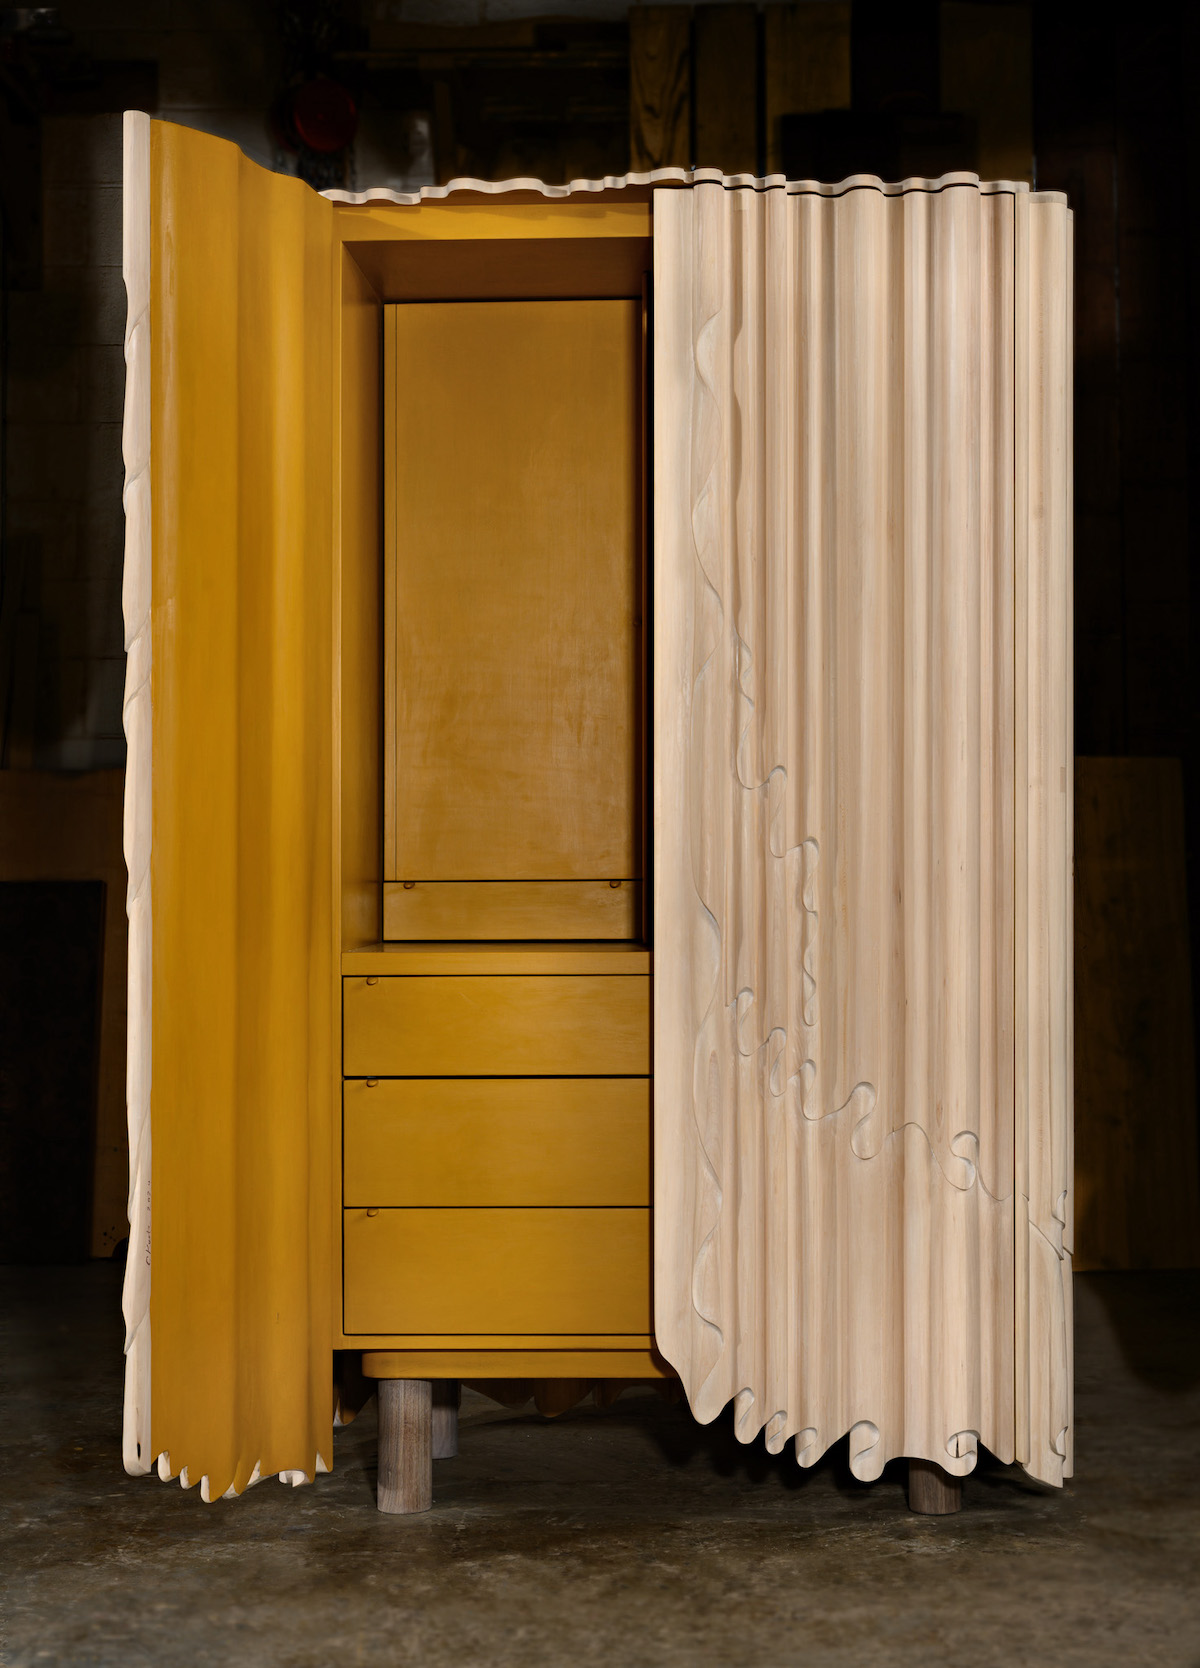 Linenfold Armoire by artist Christopher Kurtz, door open